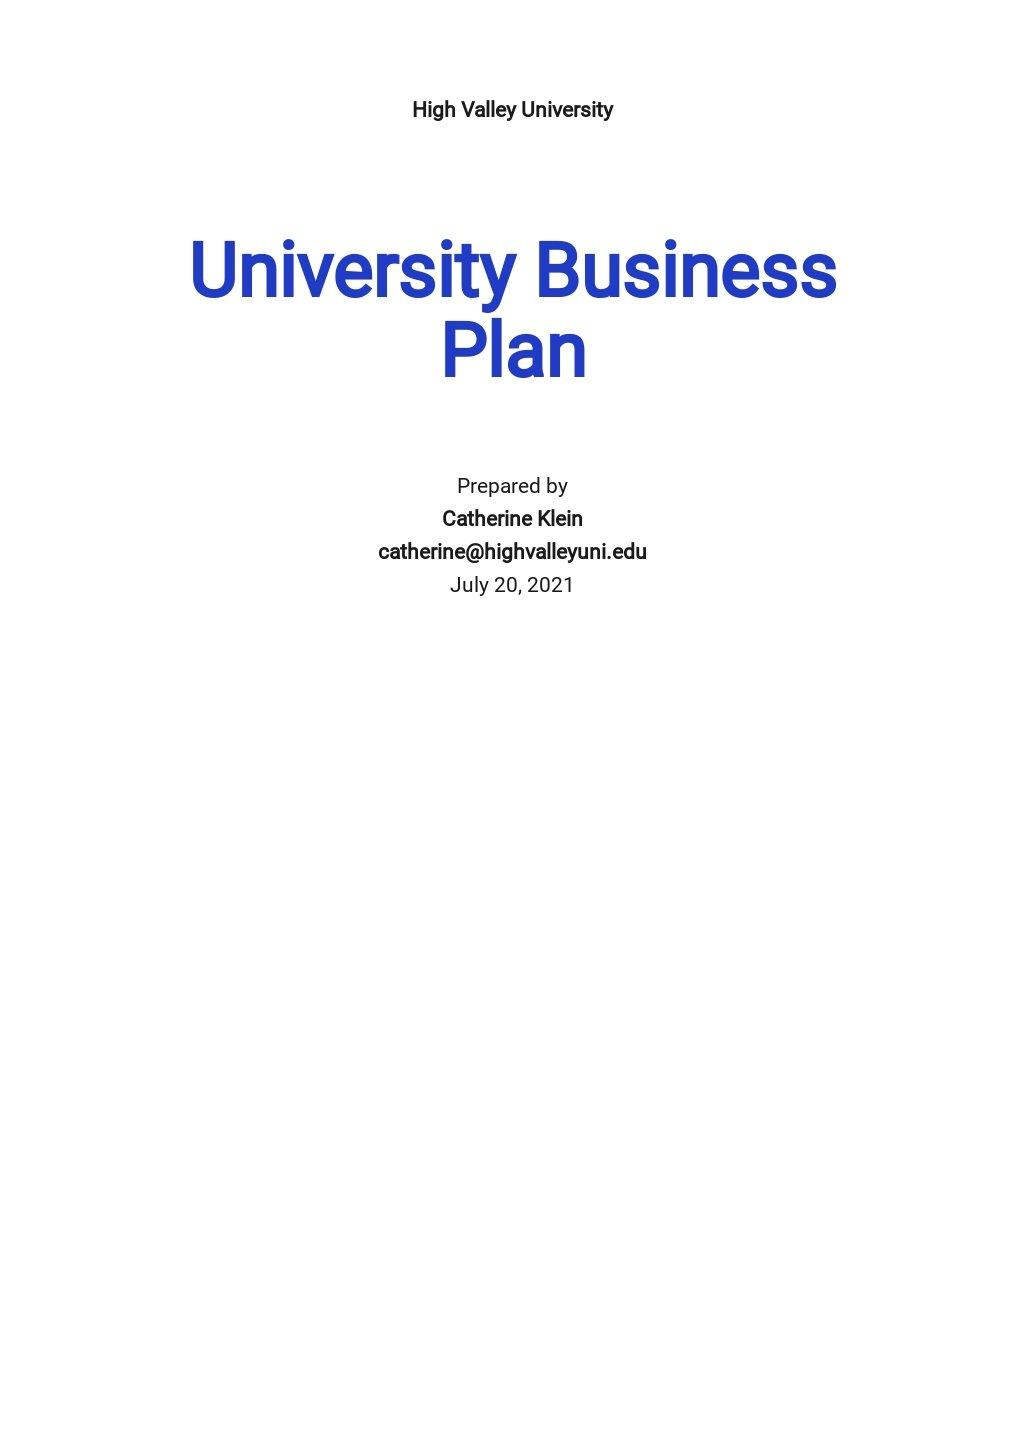 Sample University Business Plan Template